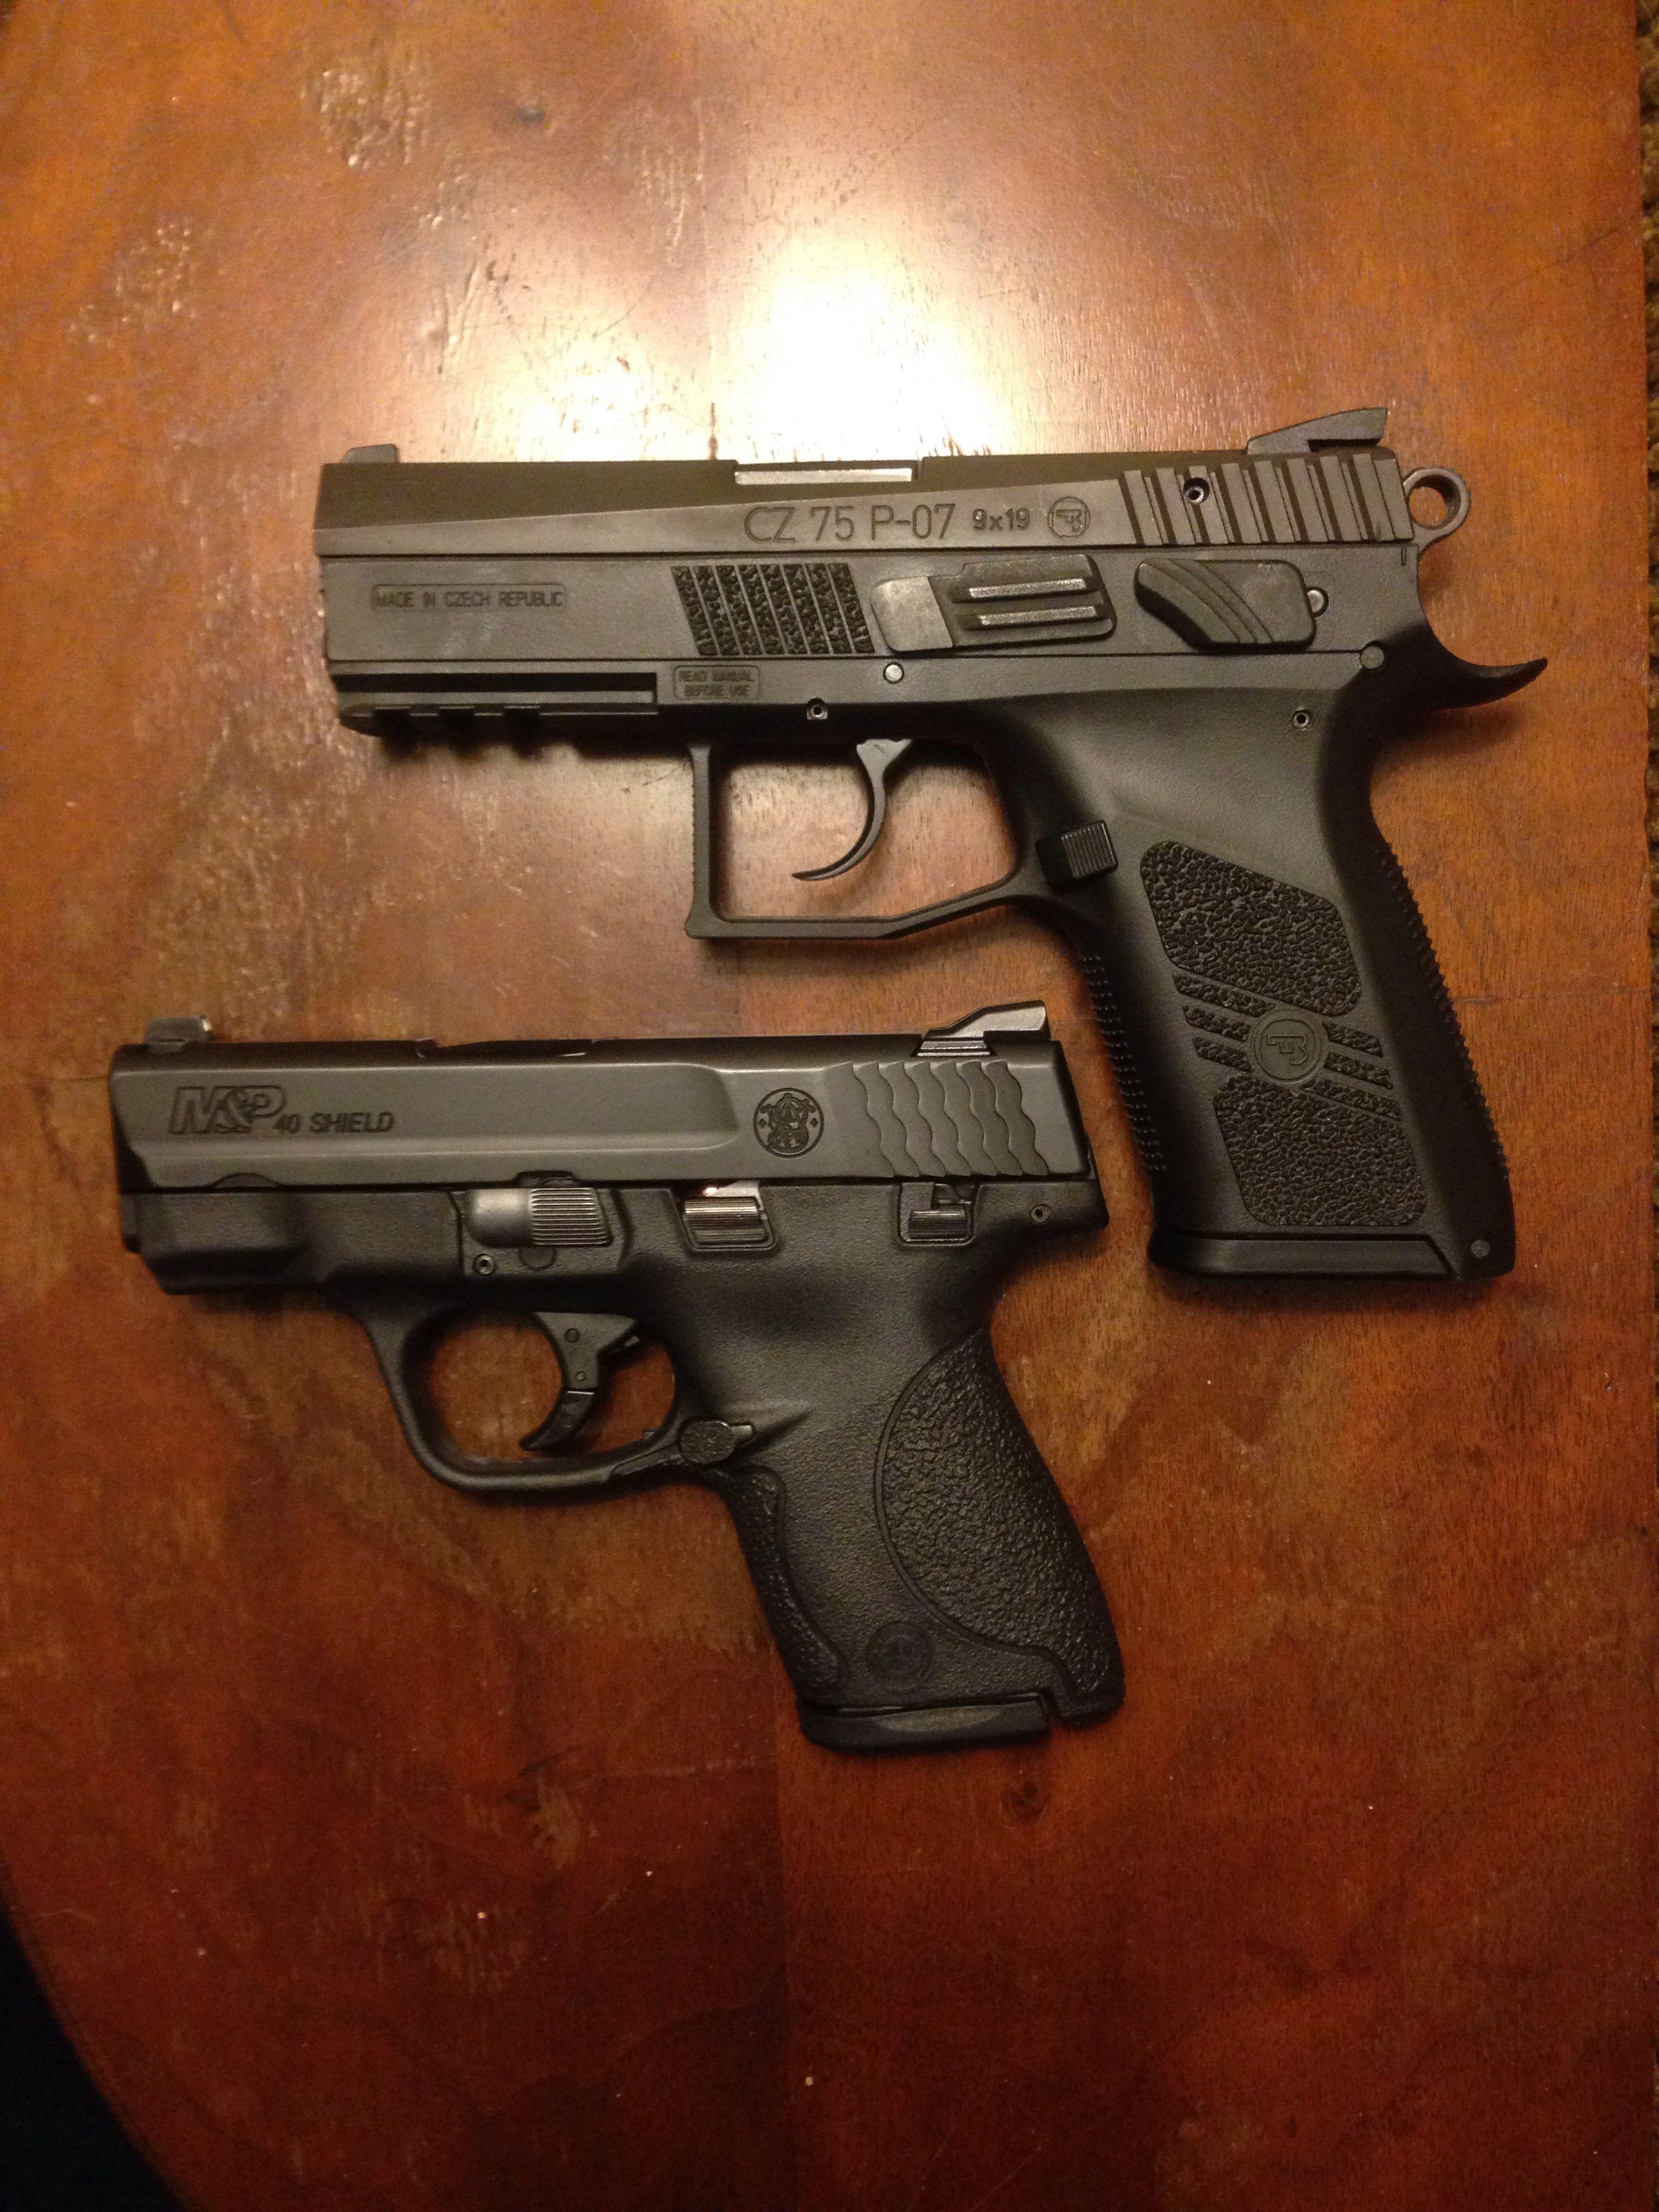 CZ 75 P-07 Duty in 9mm and S&W M&P Shield in  40 S&W | Bear